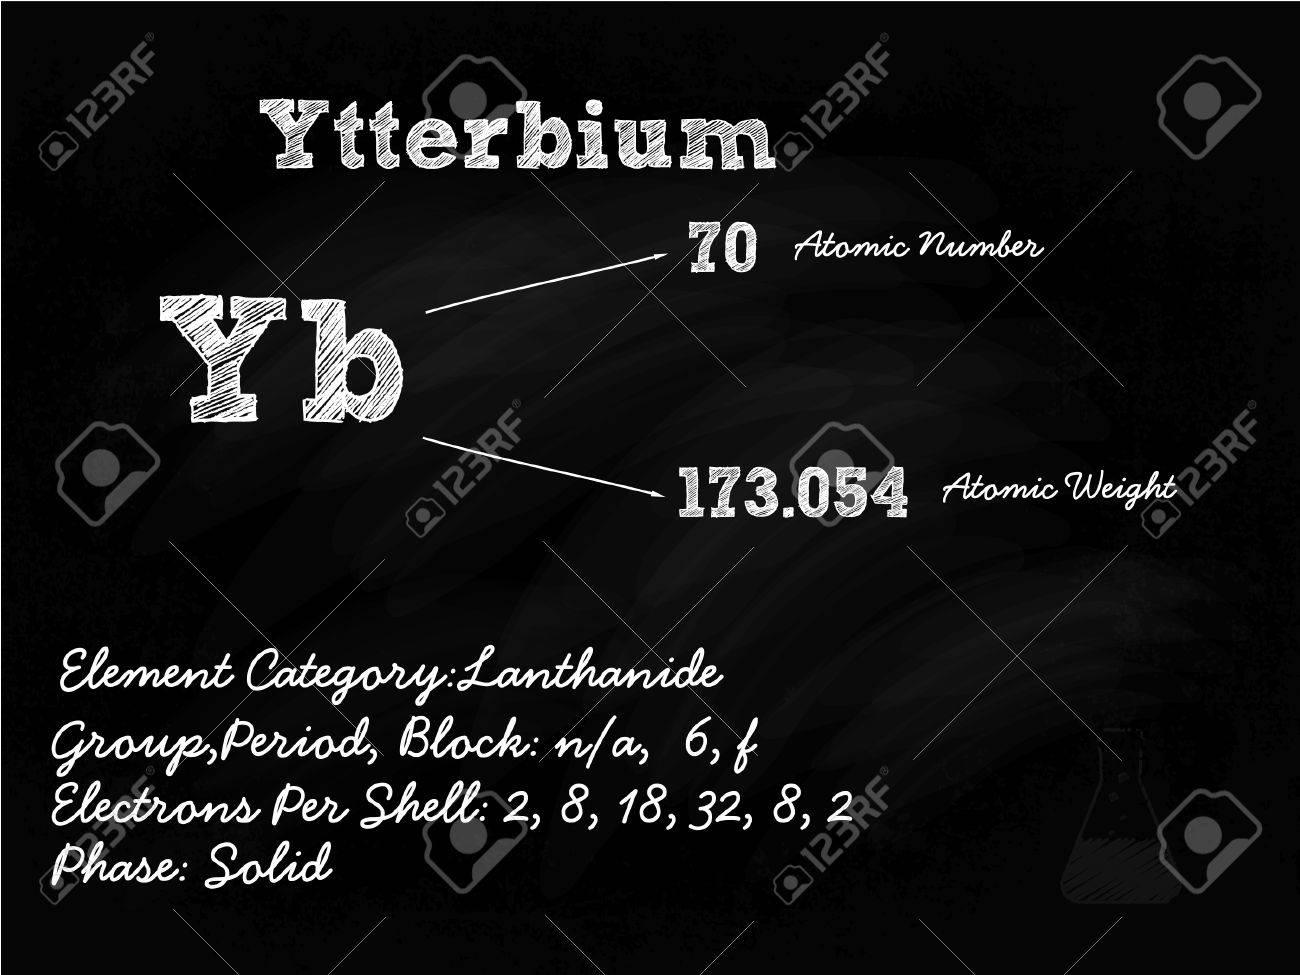 Ytterbium Symbol Illustration On Blackboard With Chalk Stock Vector - 22205257